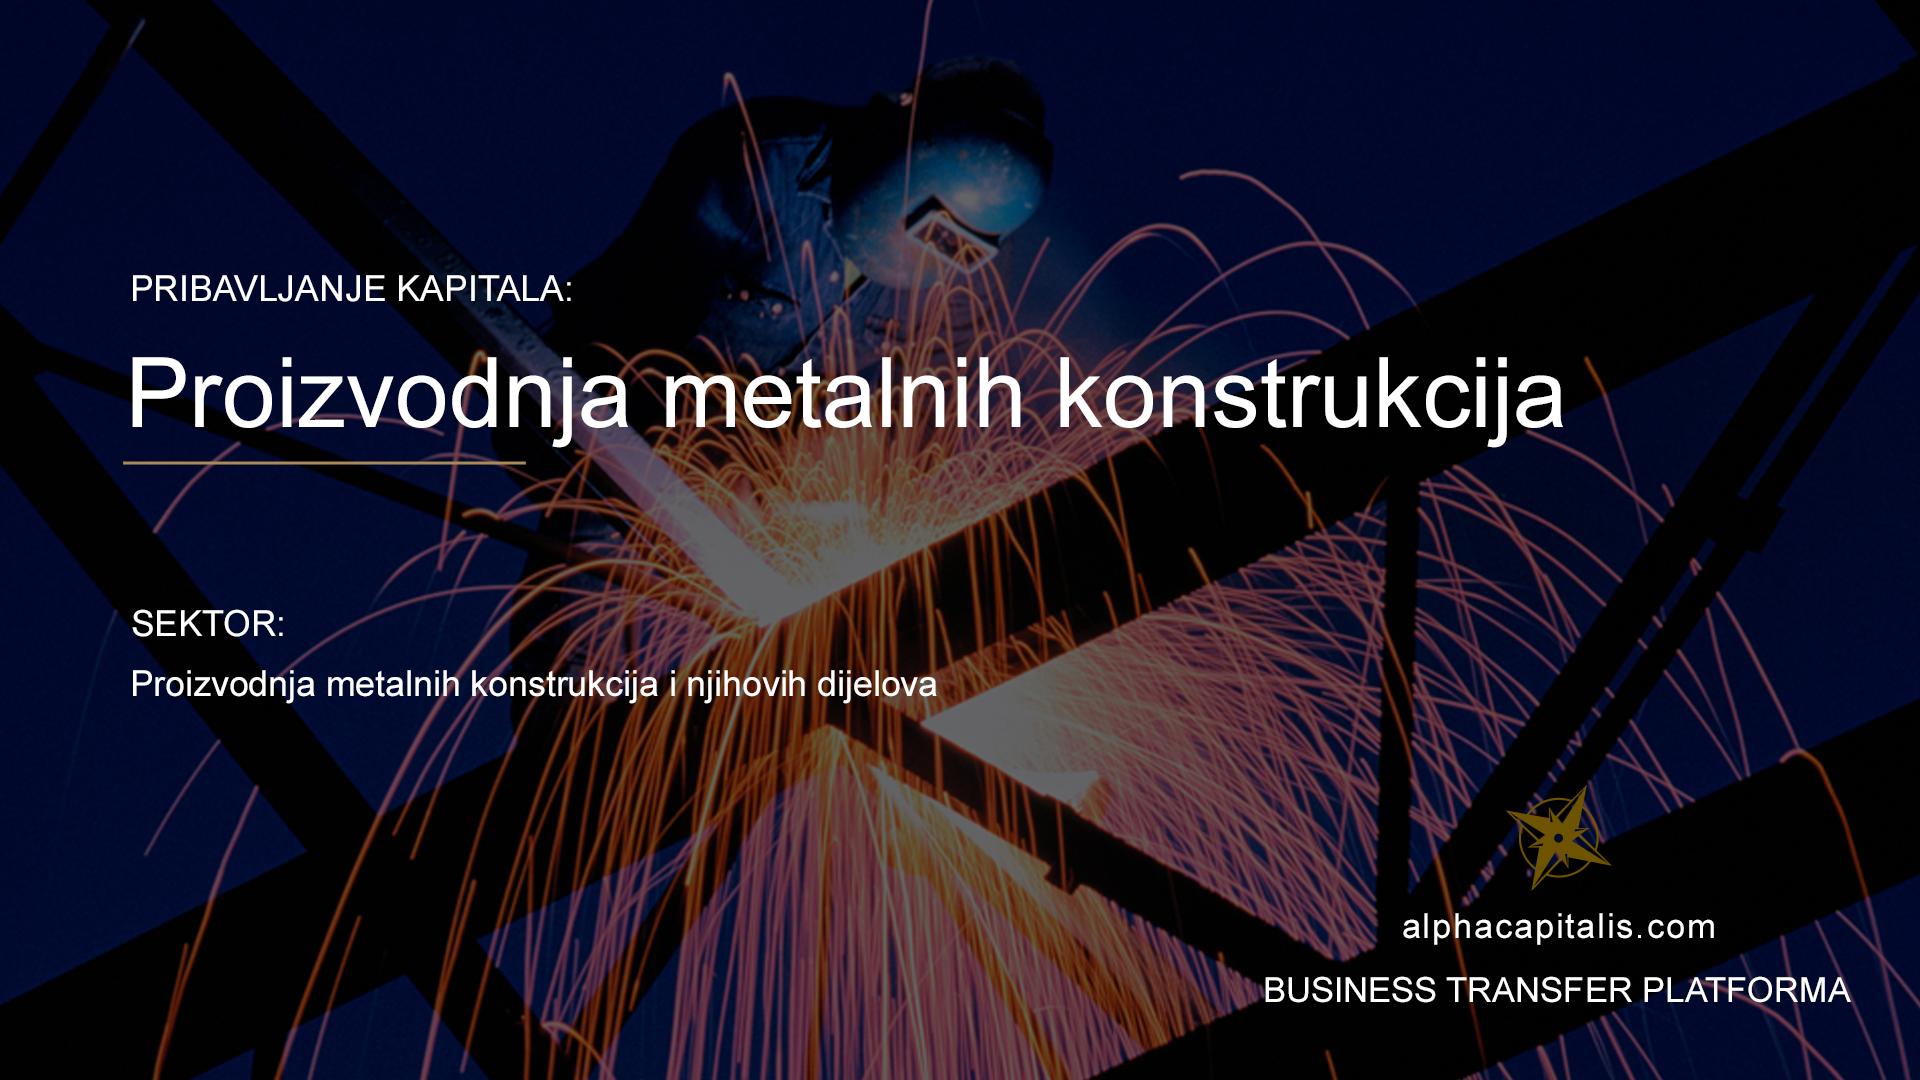 Alpha Capitalis- Business Transfer Platforma_metalne konstrukcije